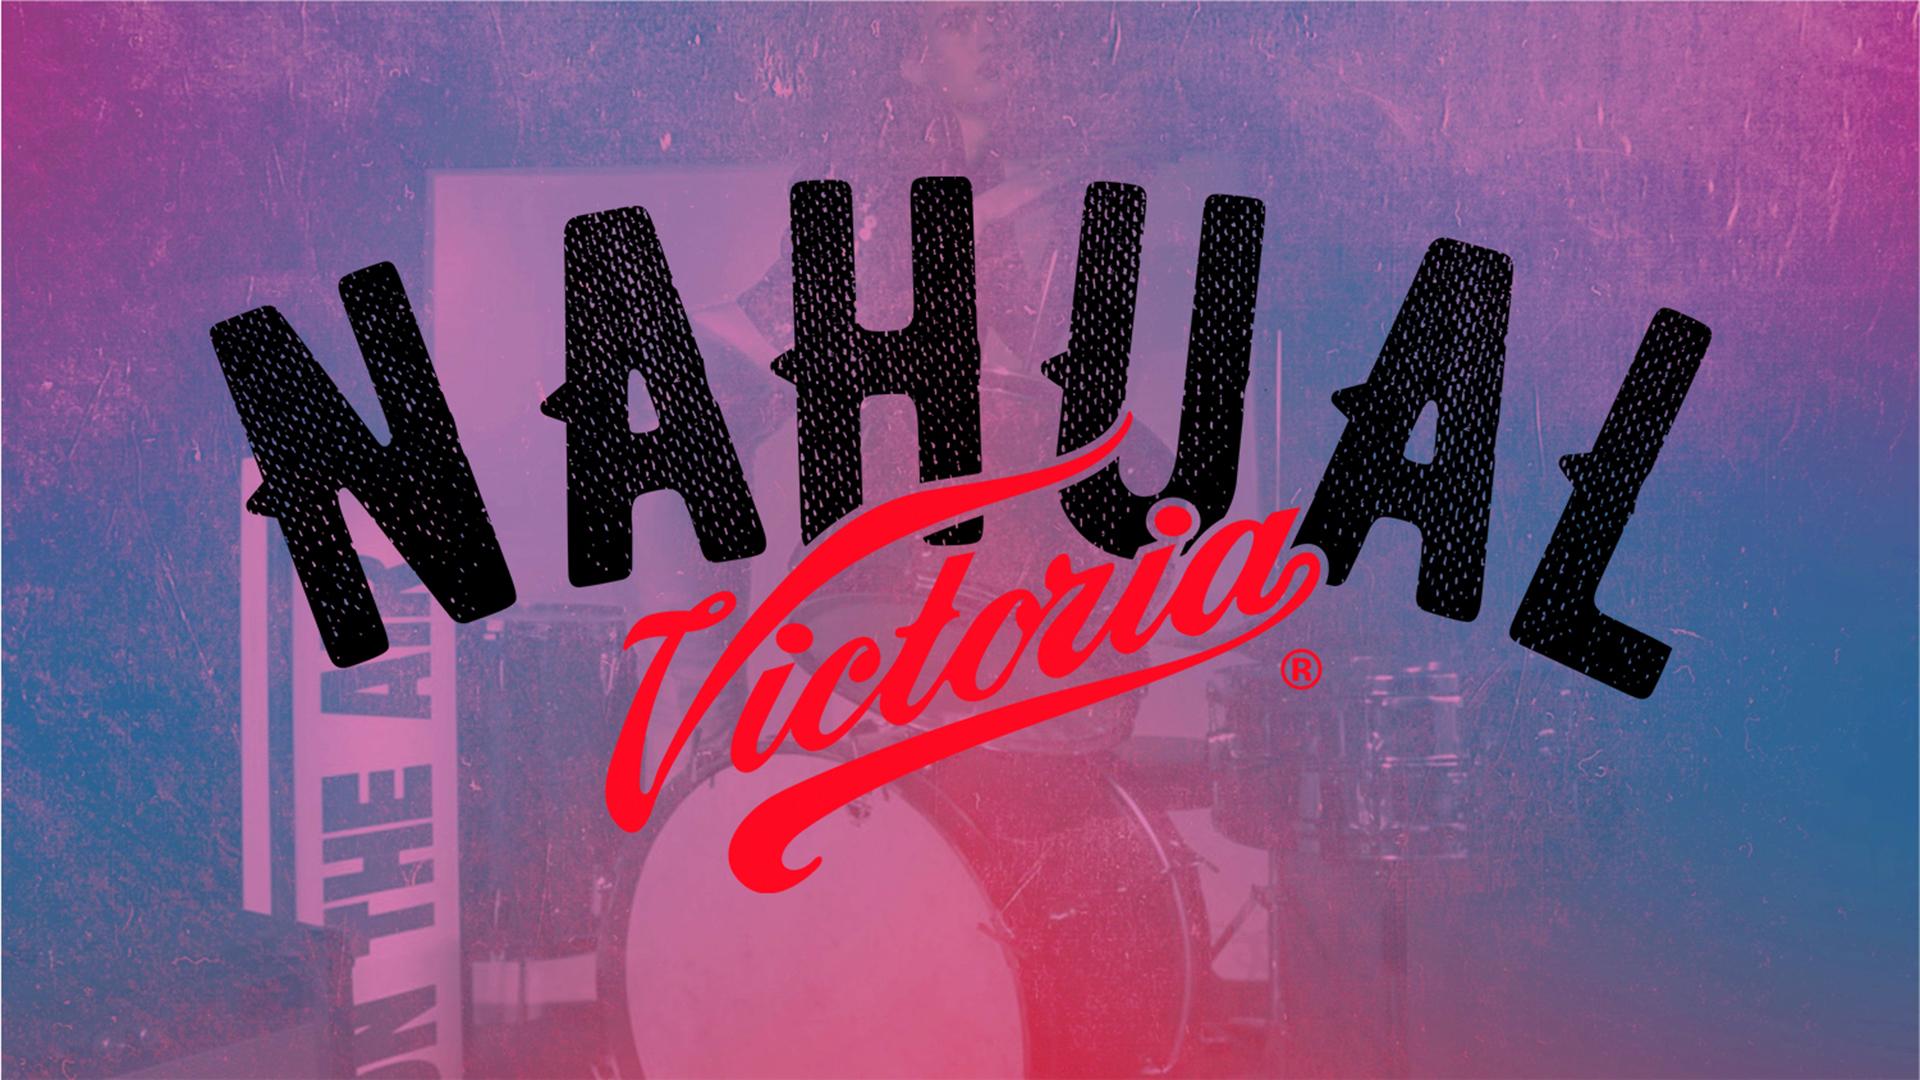 Nahual Victoria: un concurso para estudiantes de moda #FestivalDeFrente